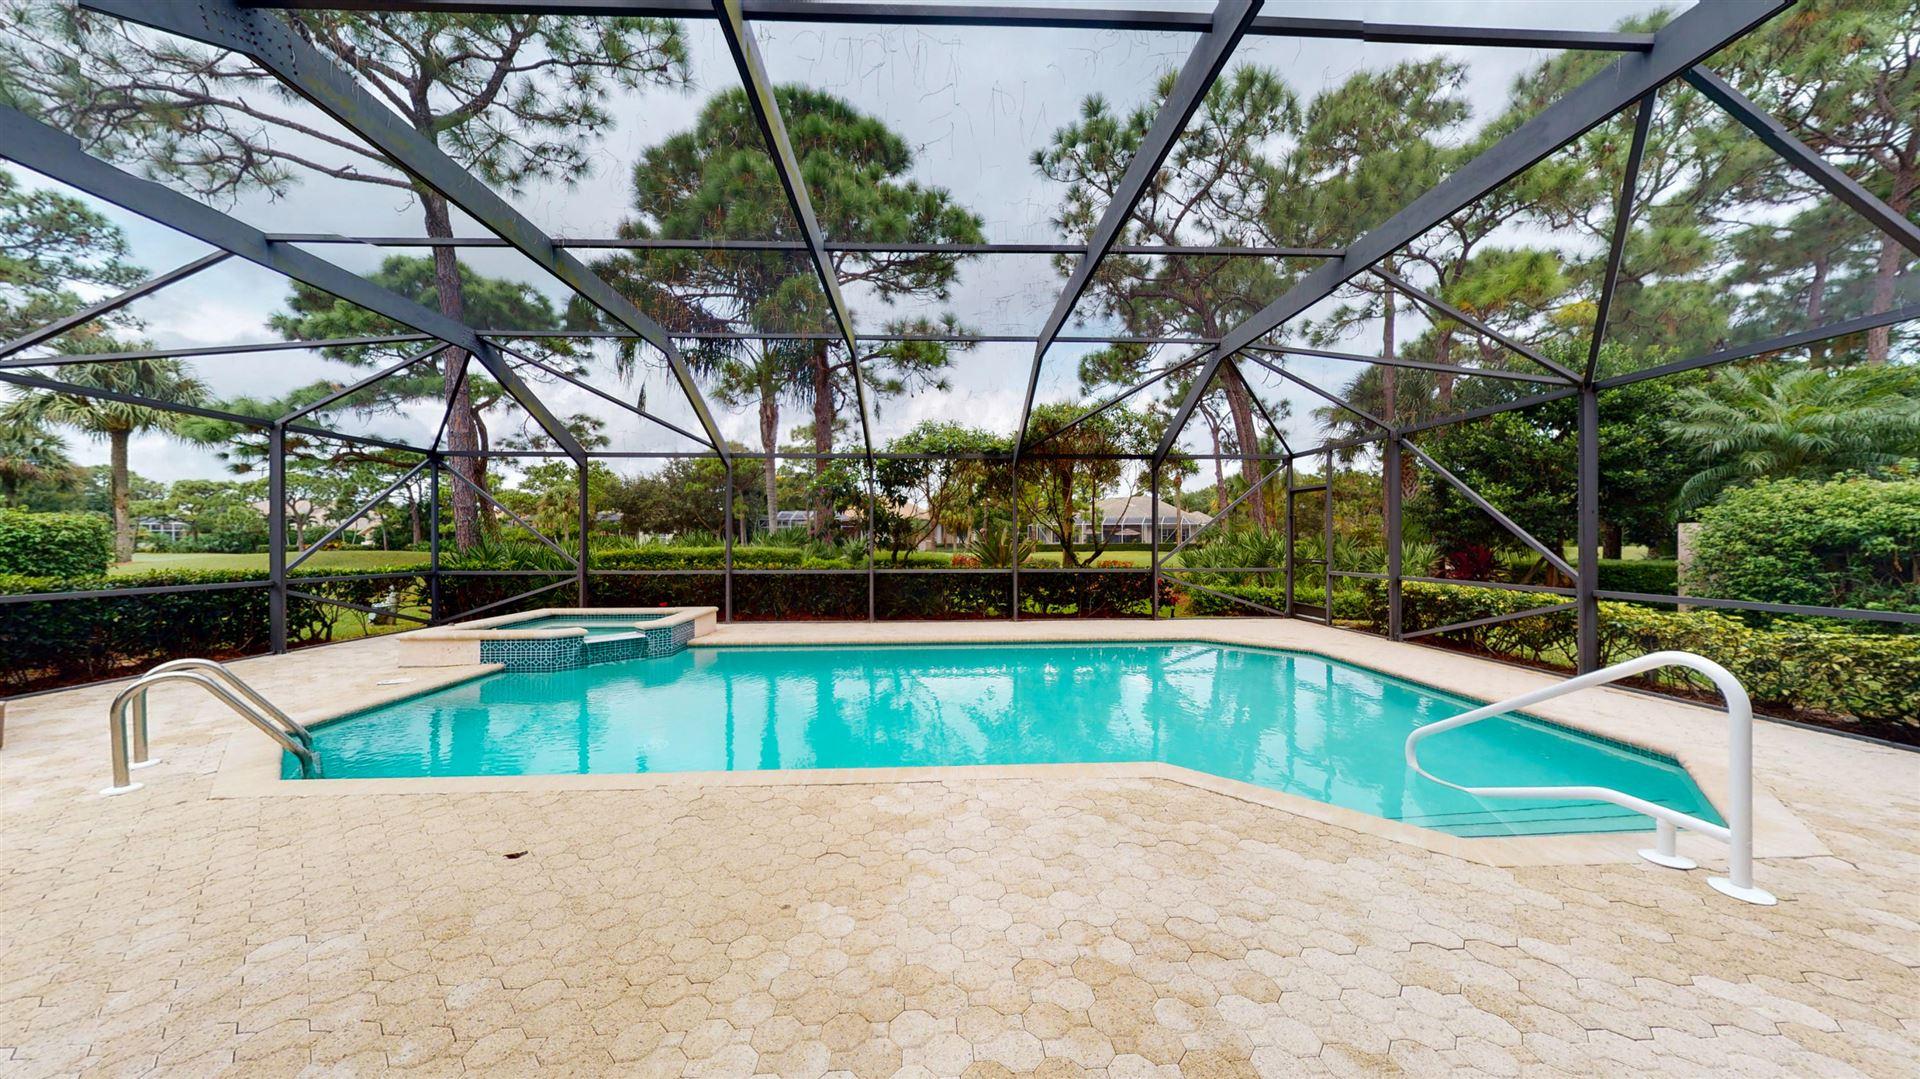 1401 SE Brewster Place, Stuart, FL 34997 - #: RX-10664692